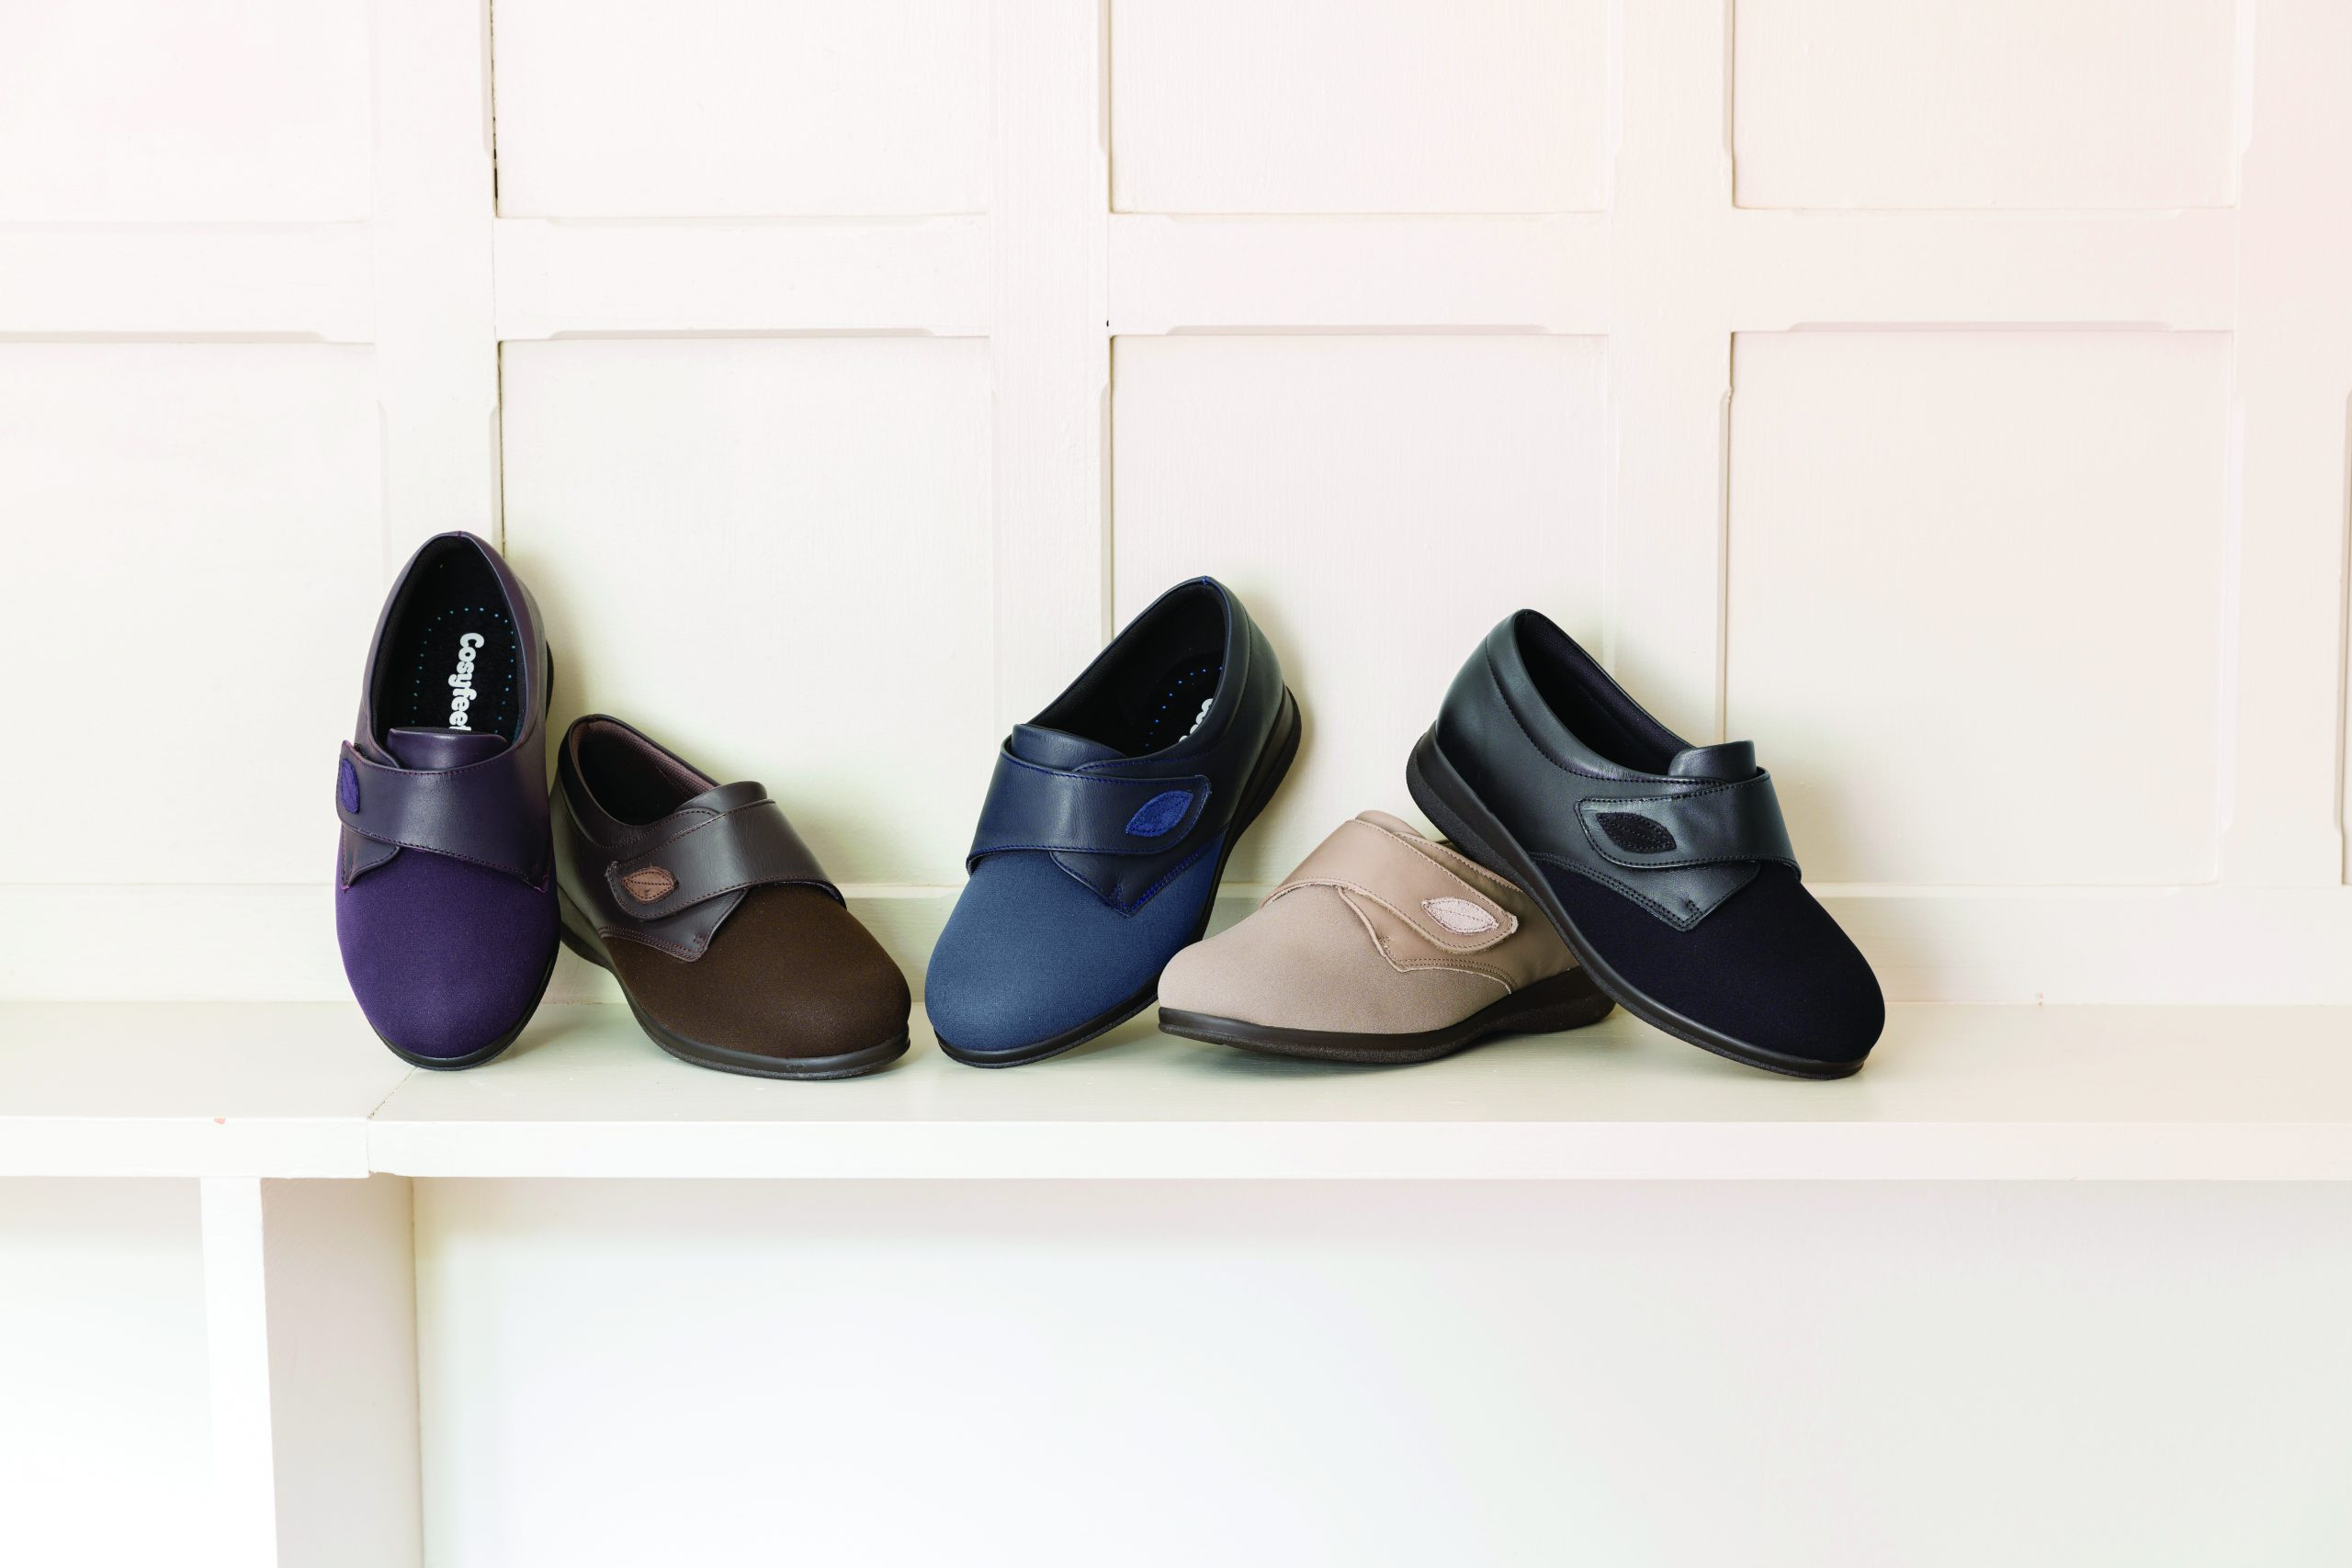 Cosyfeet wide fitting comfort footwear